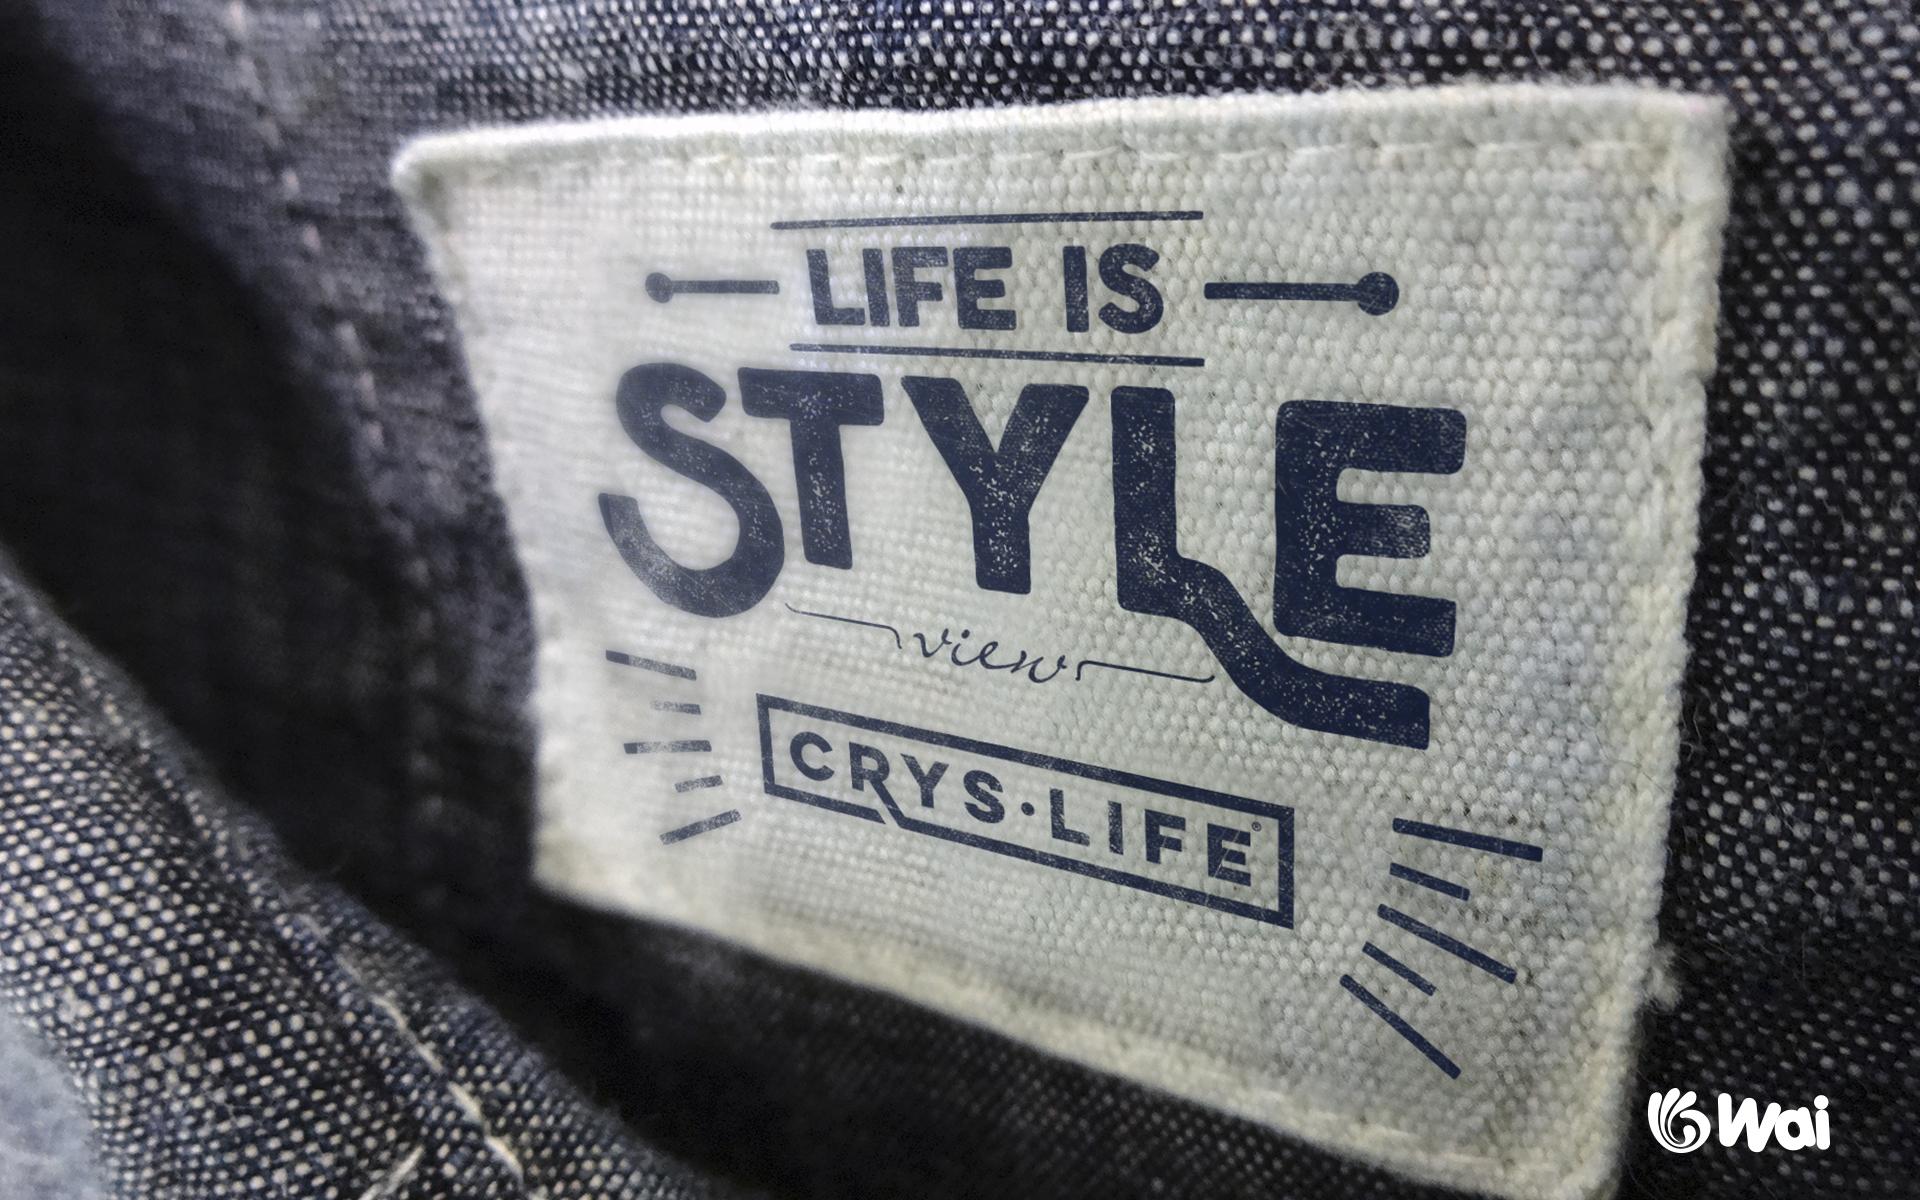 CrysLife CrysLife 01 108